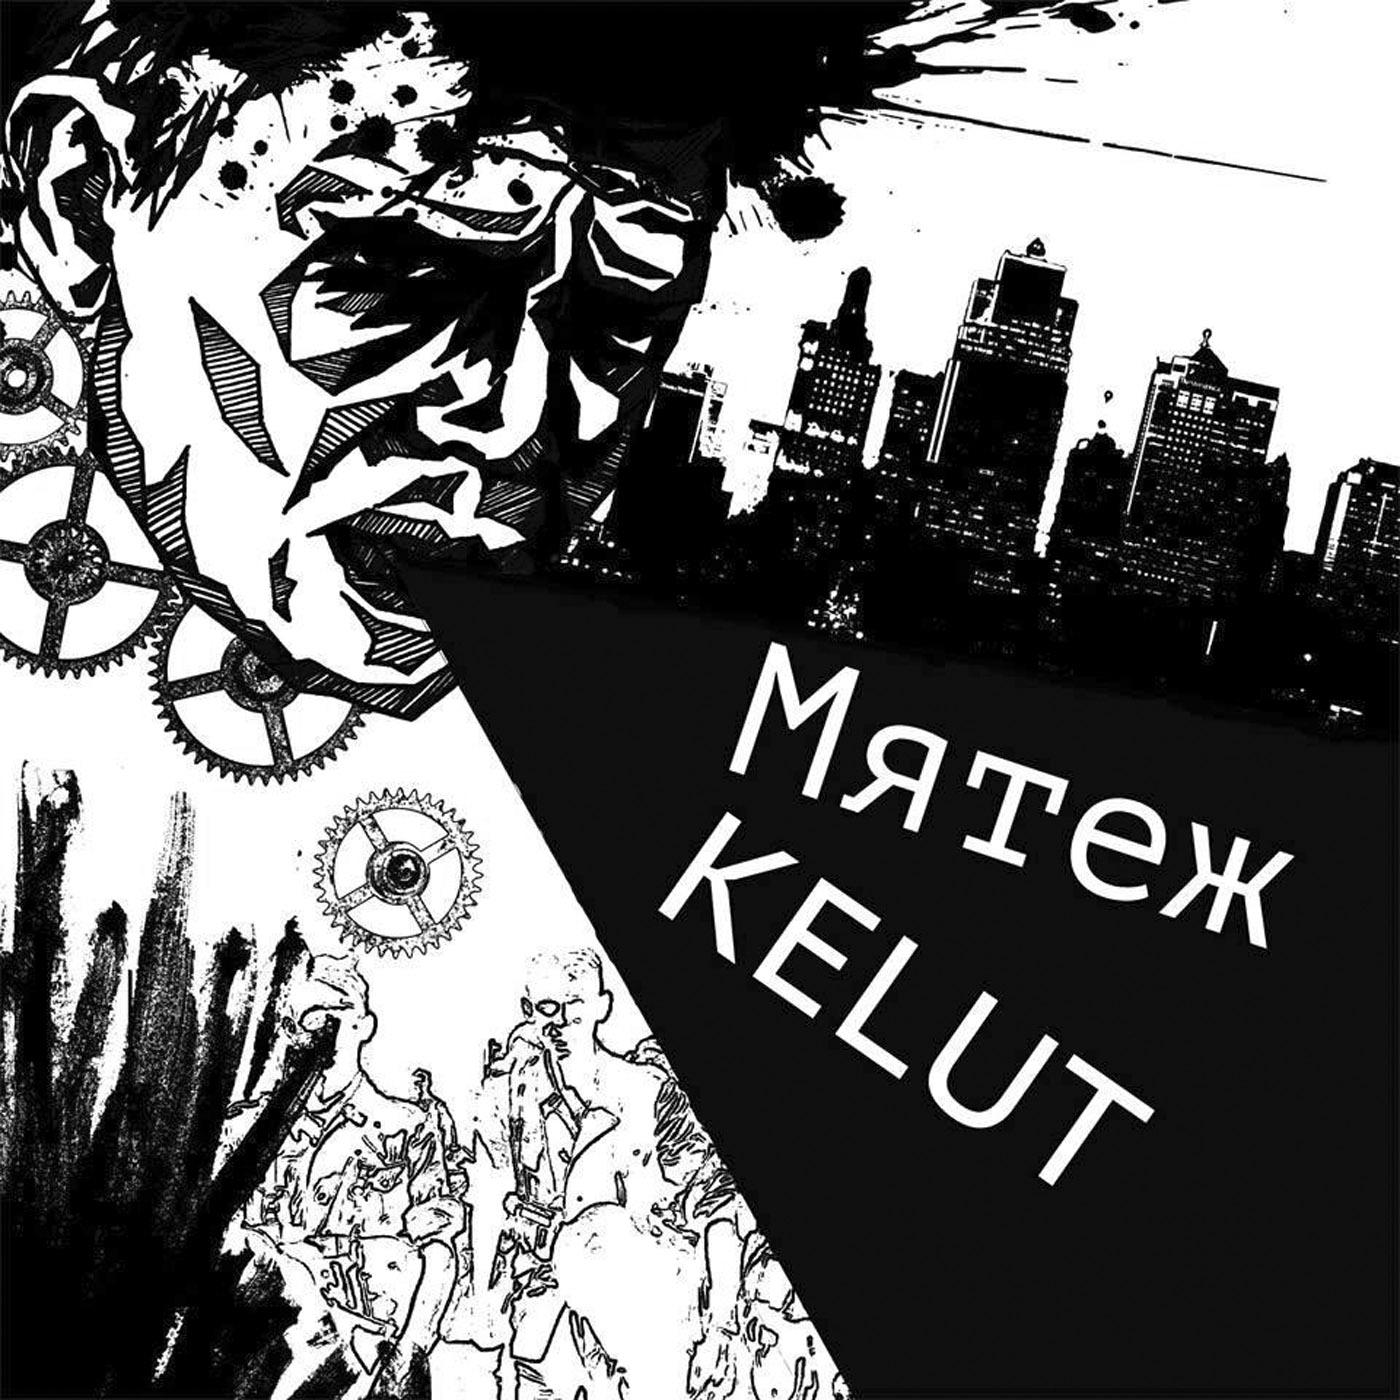 Mrtex/Kelut LP - $12